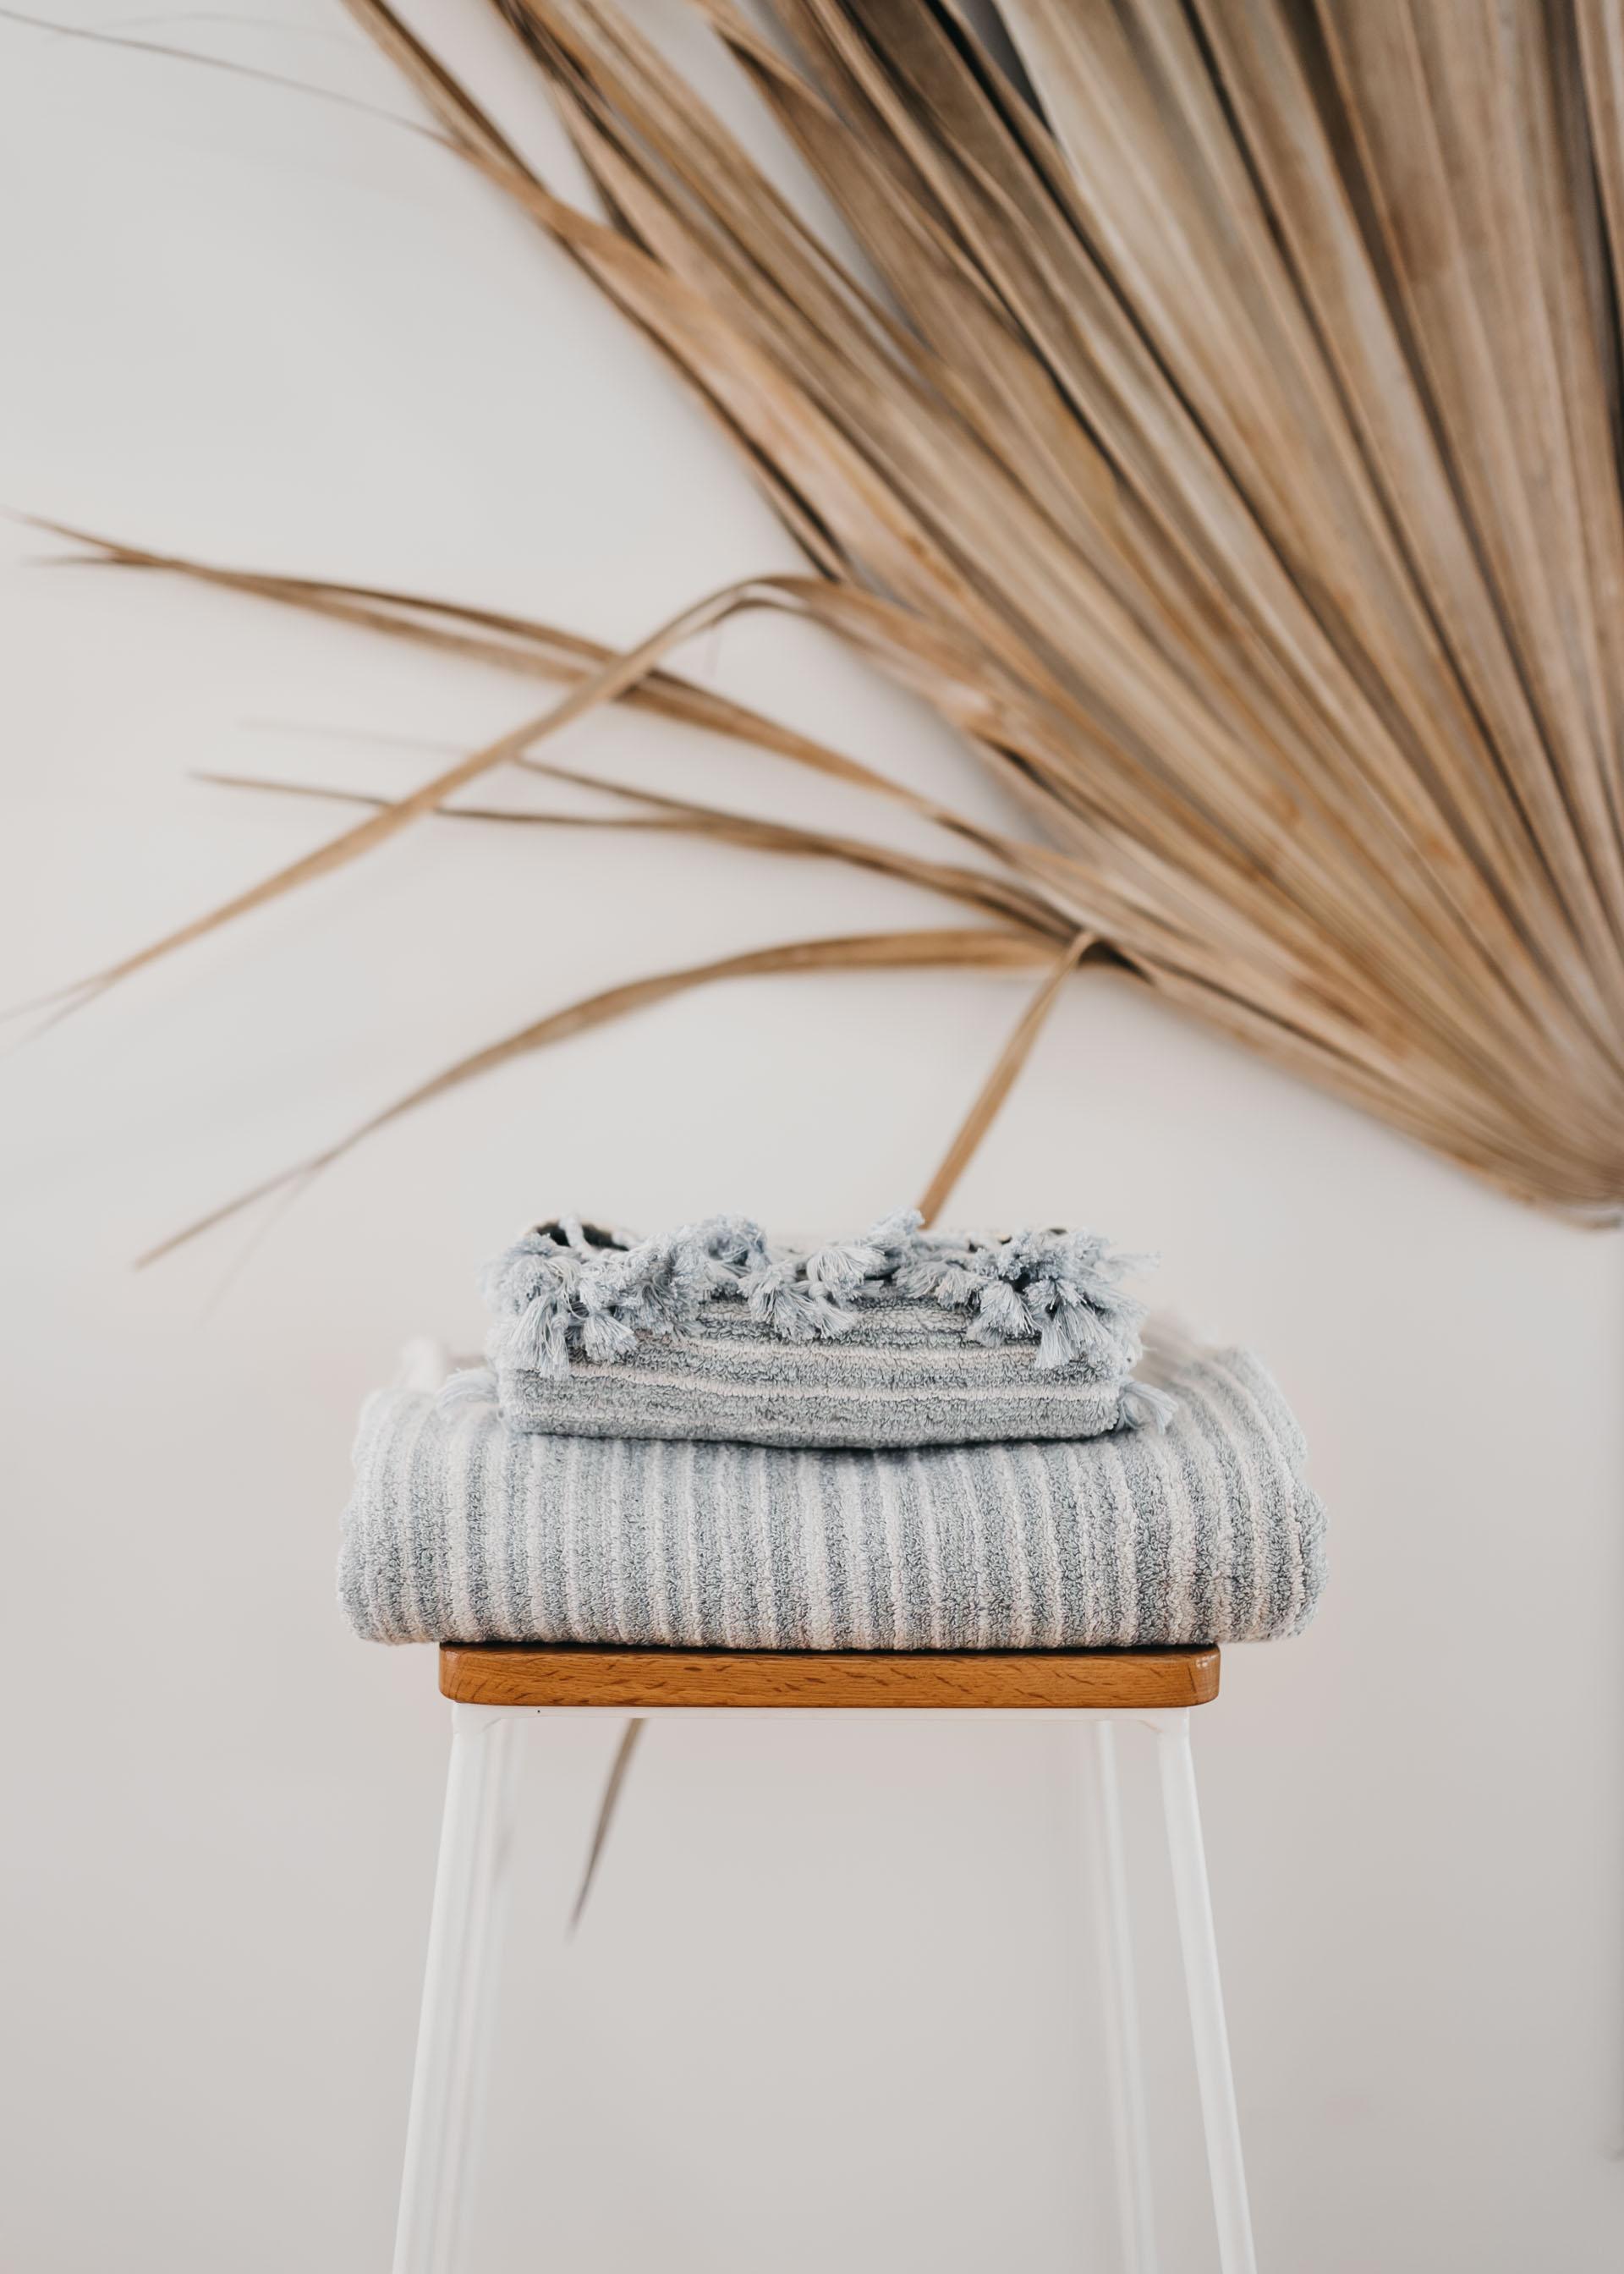 keira-mason-aegean-loom-blue-towels.jpg